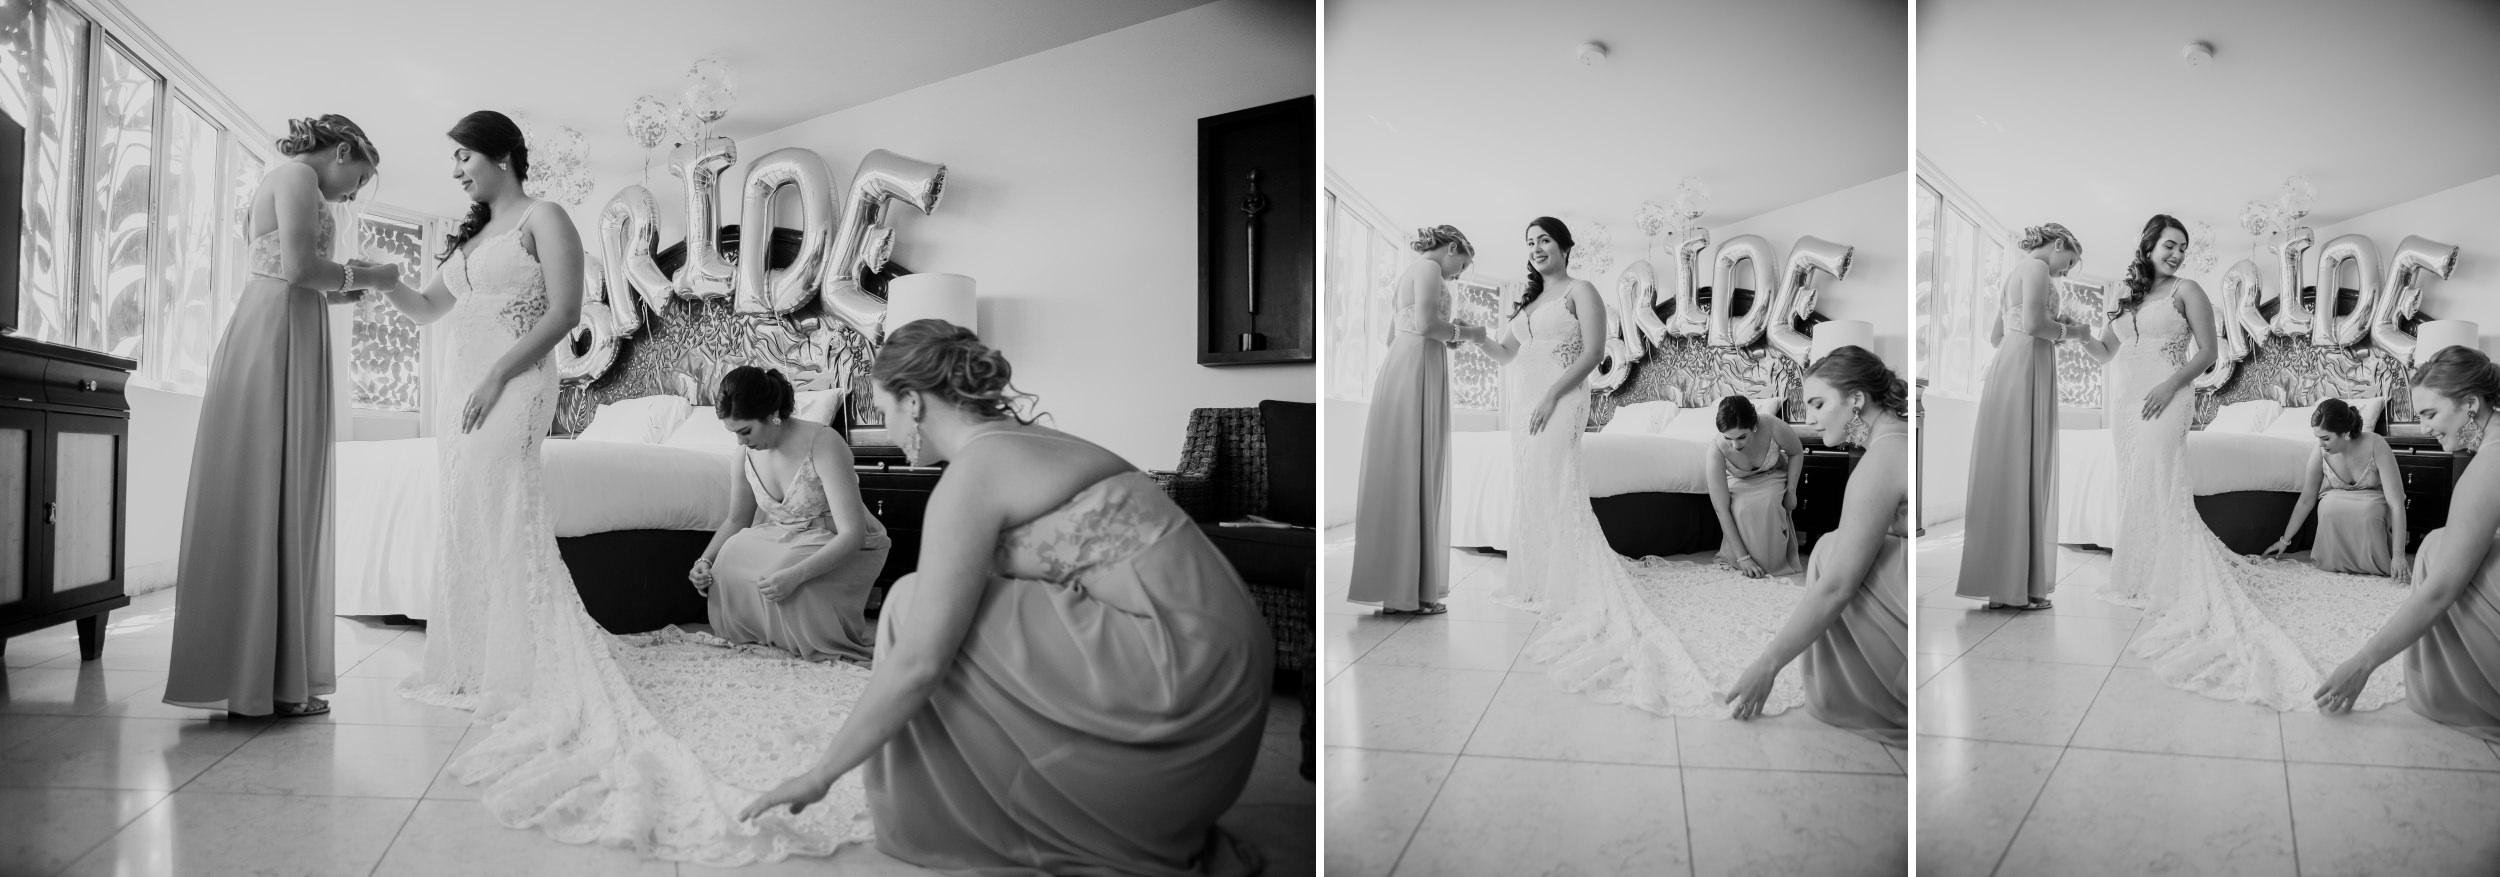 Wedding - Rusty Pelican - Key Biscayne - Santy Martinez Photography 12.jpg